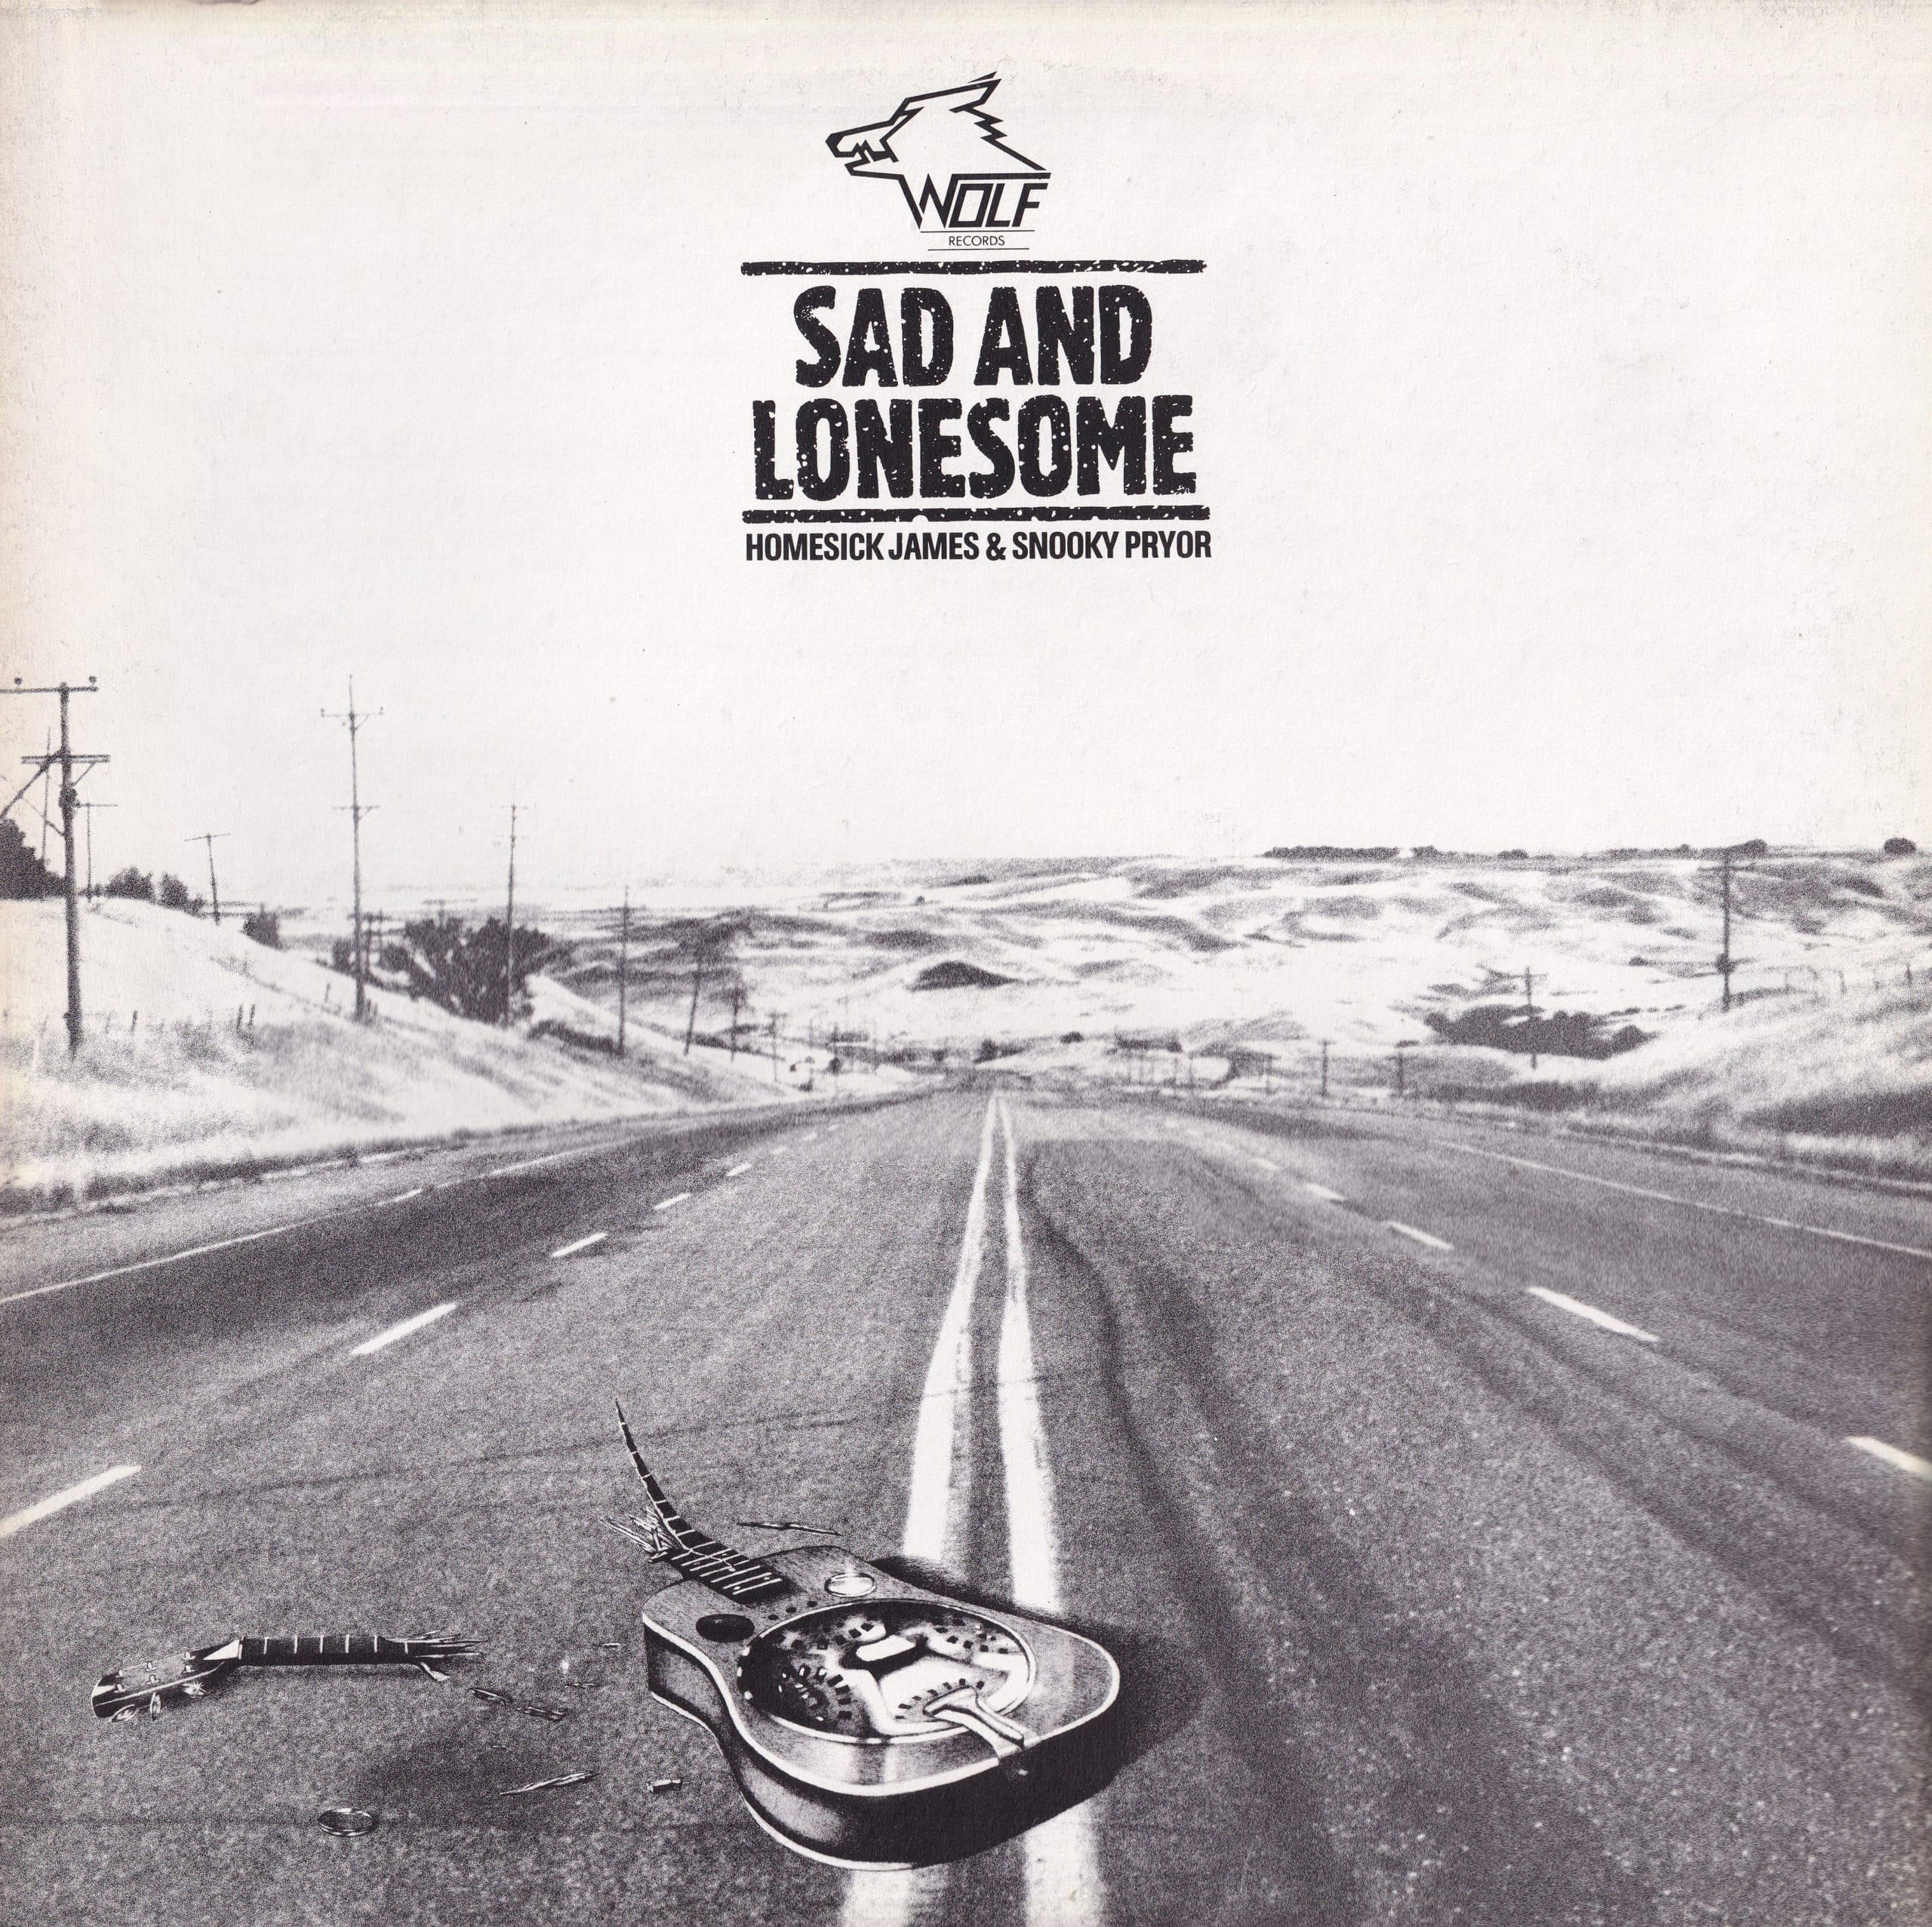 Sad And Lonesome – 1